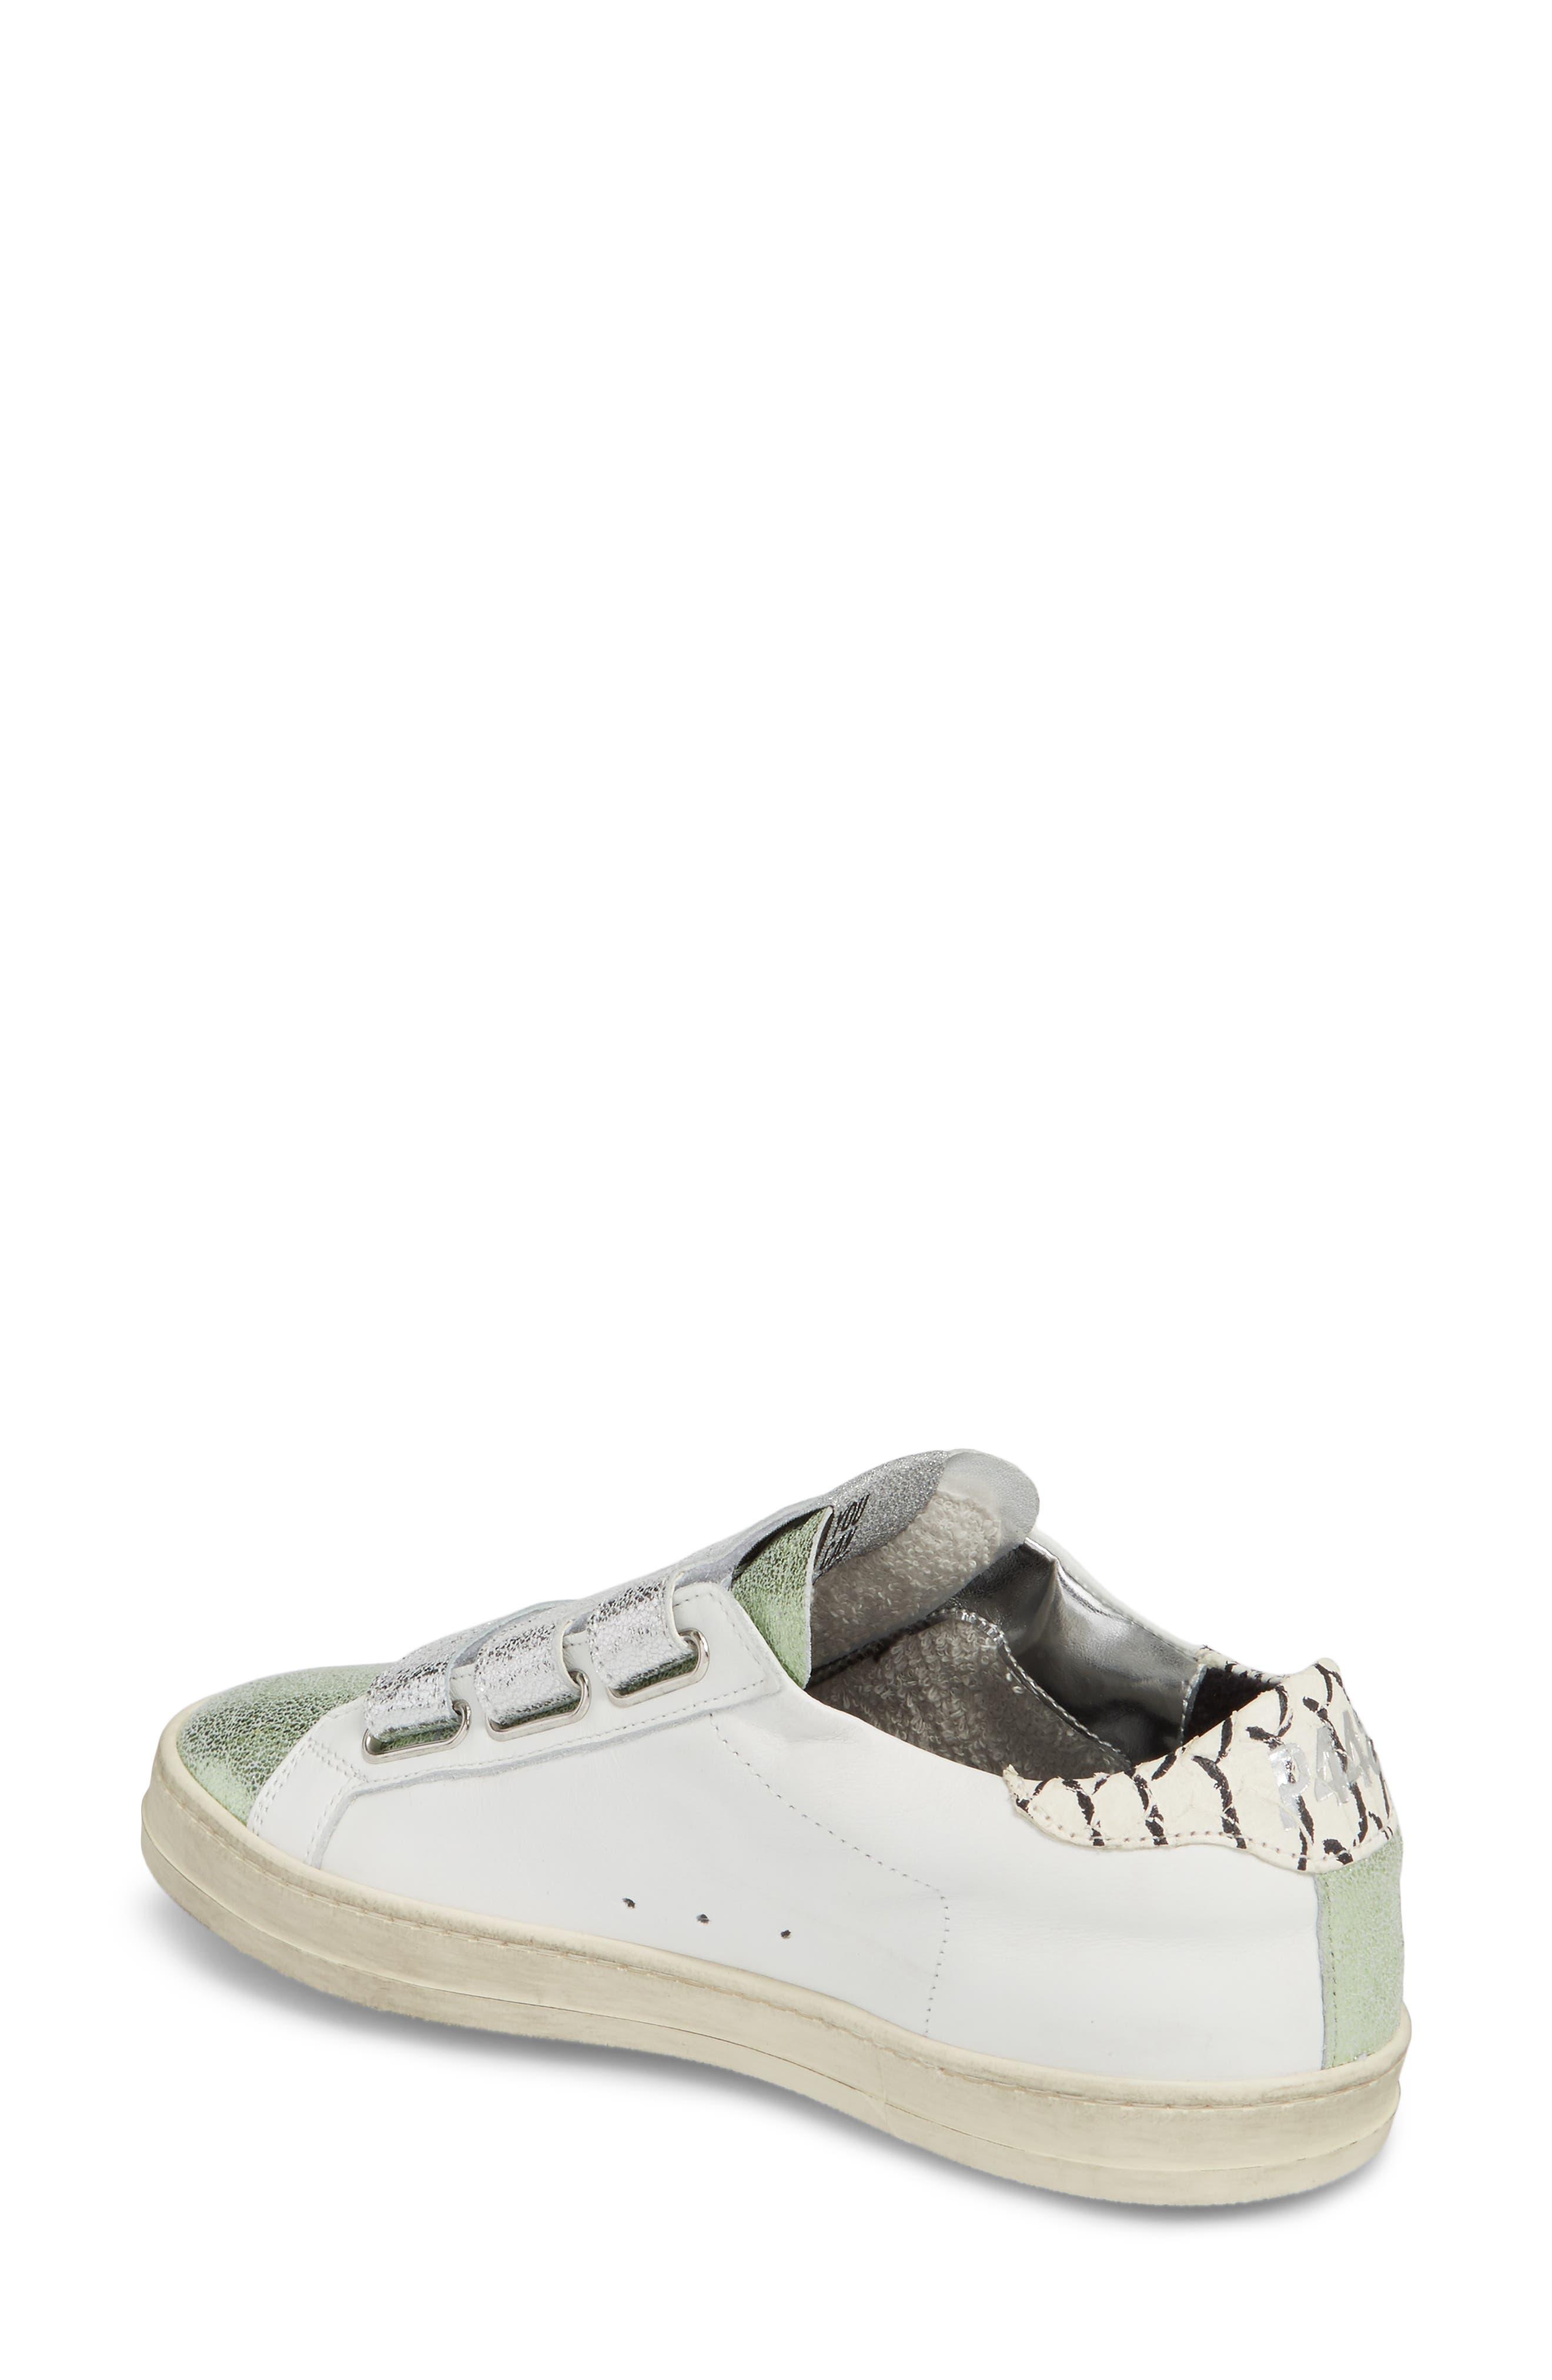 Ralph Sneaker,                             Alternate thumbnail 2, color,                             Green